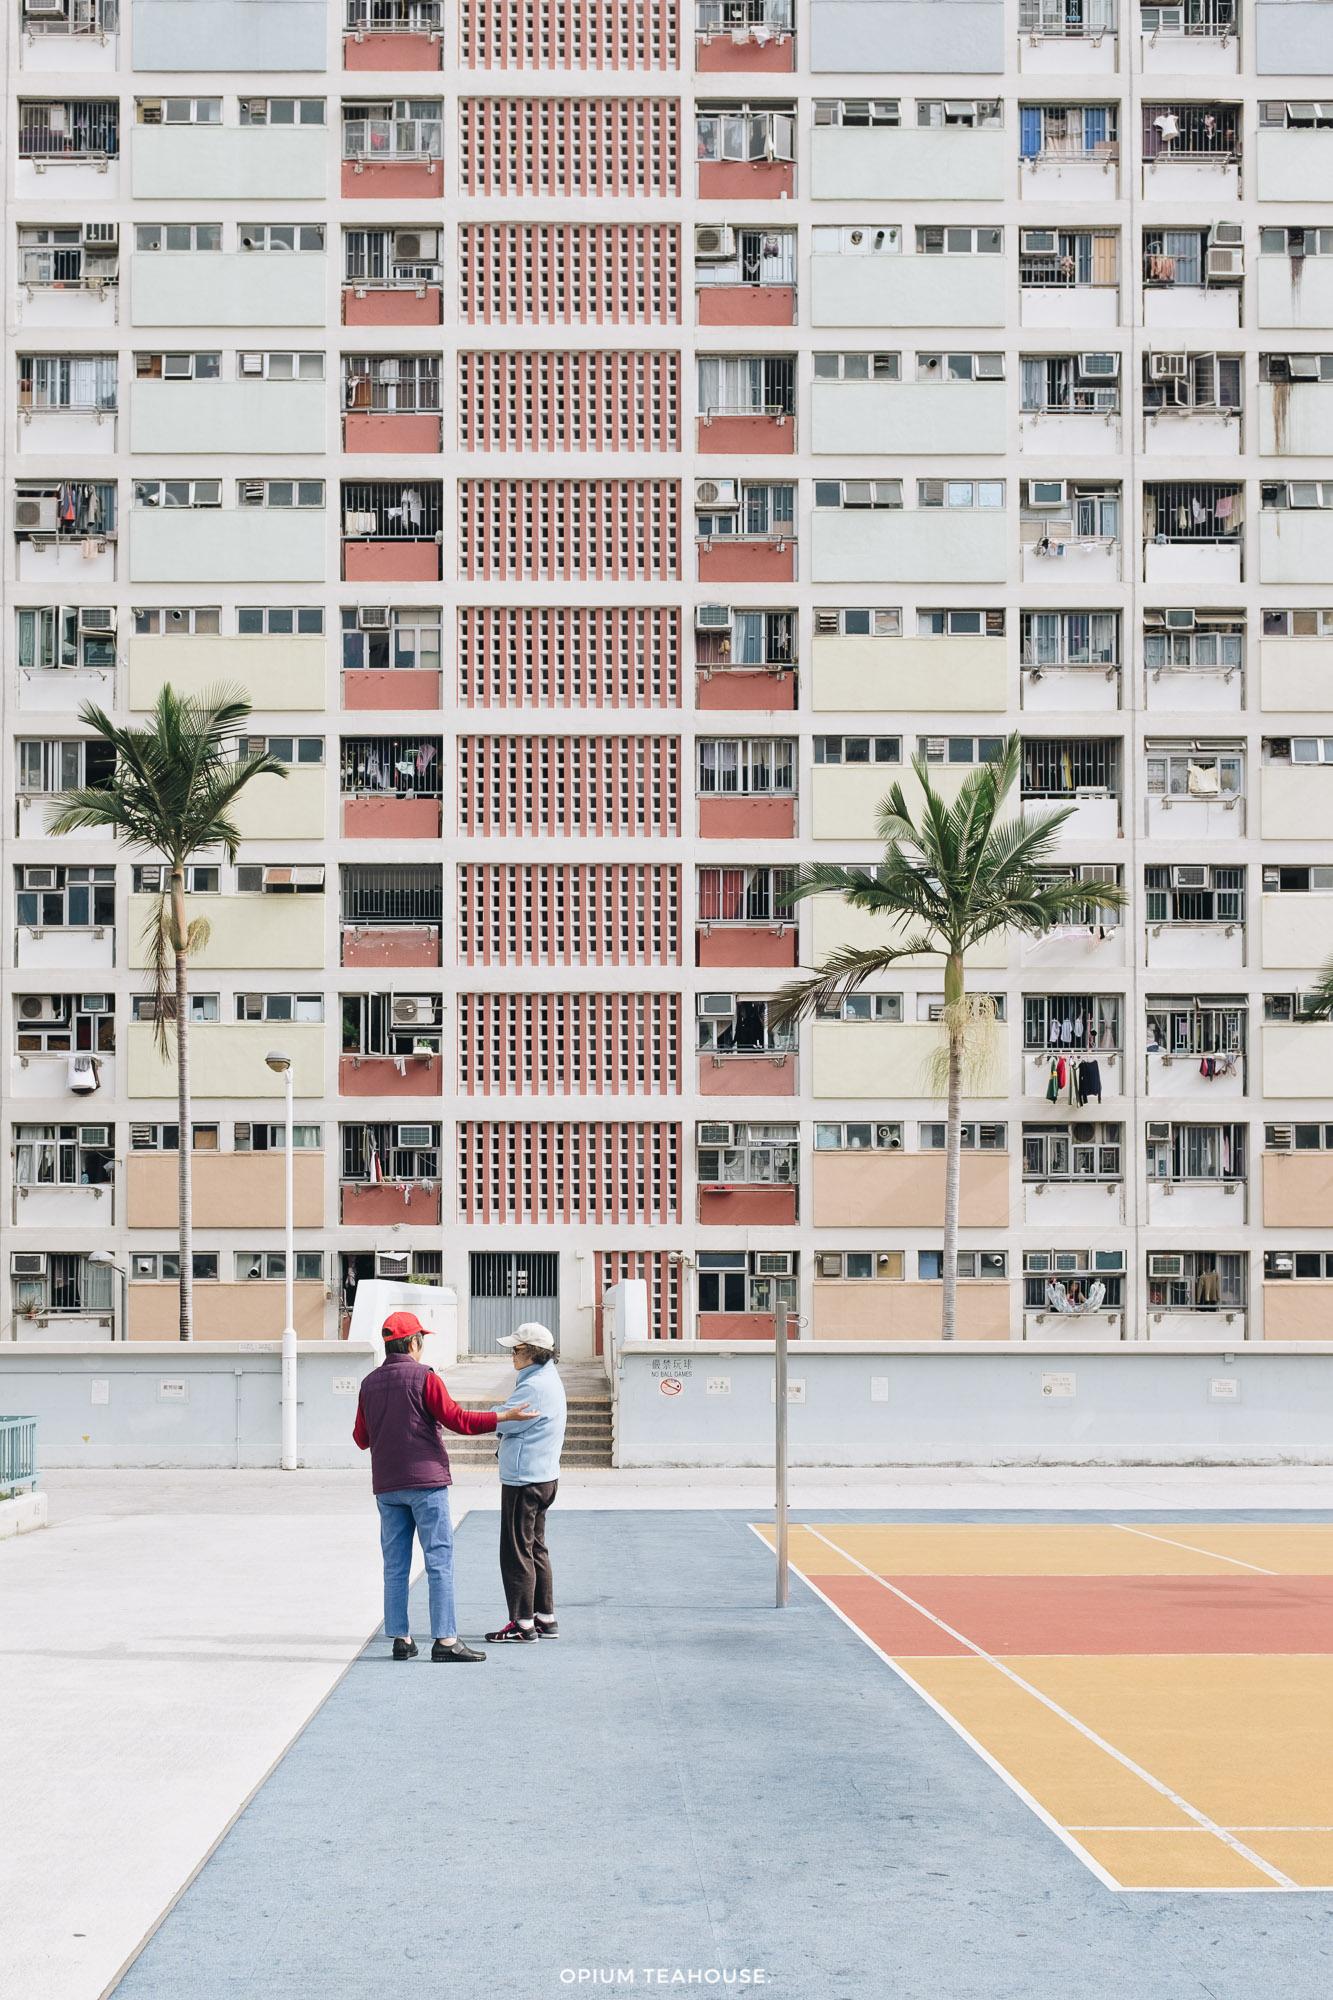 OTH_9621_2017, Choi Hung Estate, Hong Kong.jpg